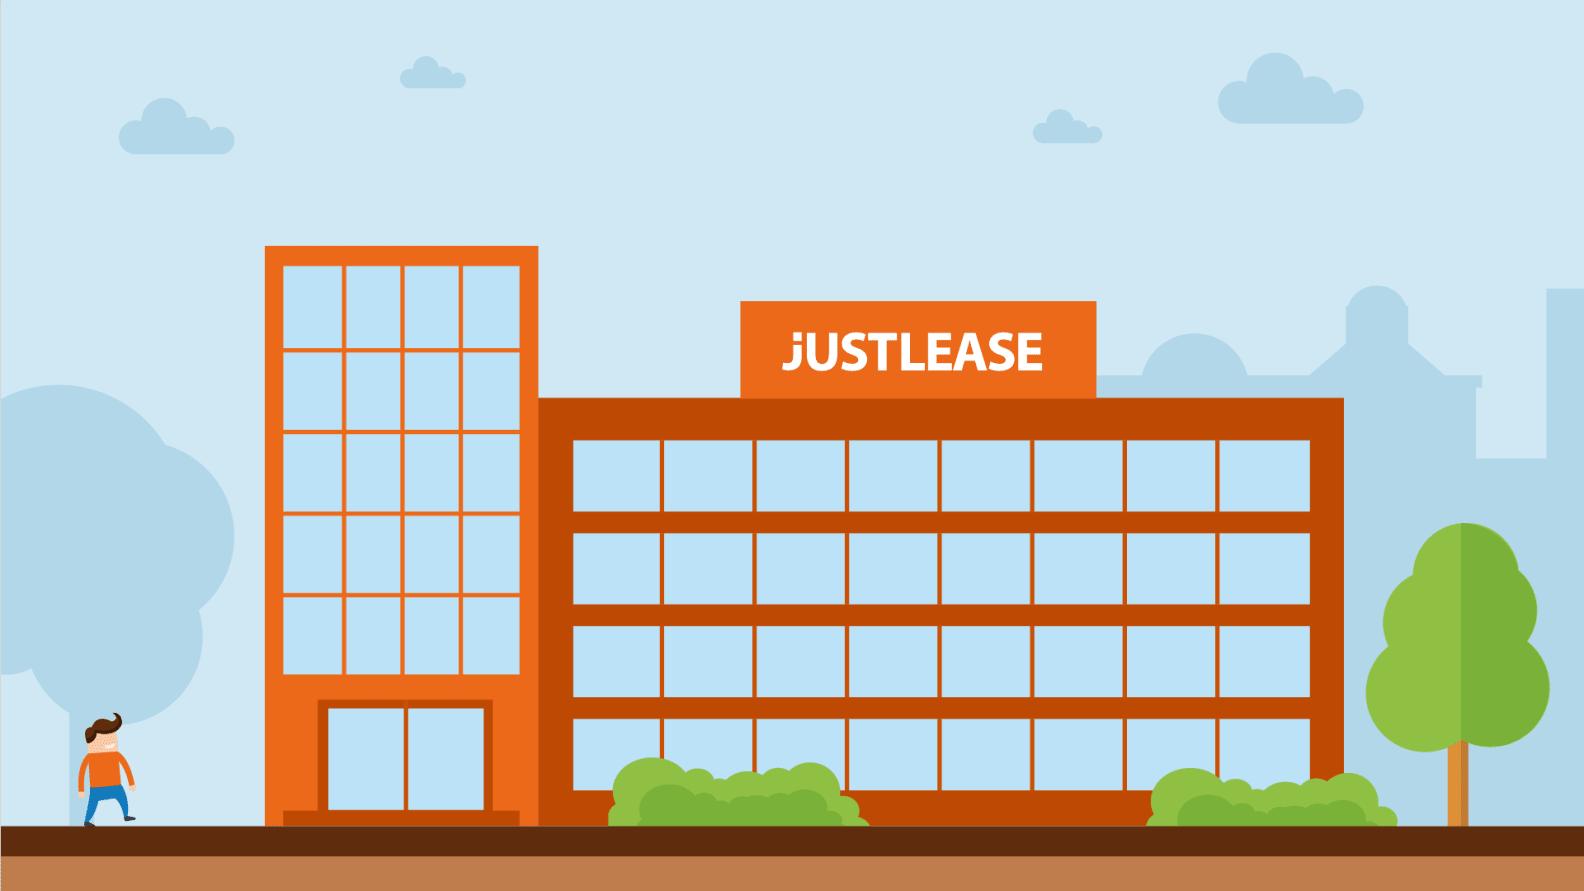 Justlease HQ